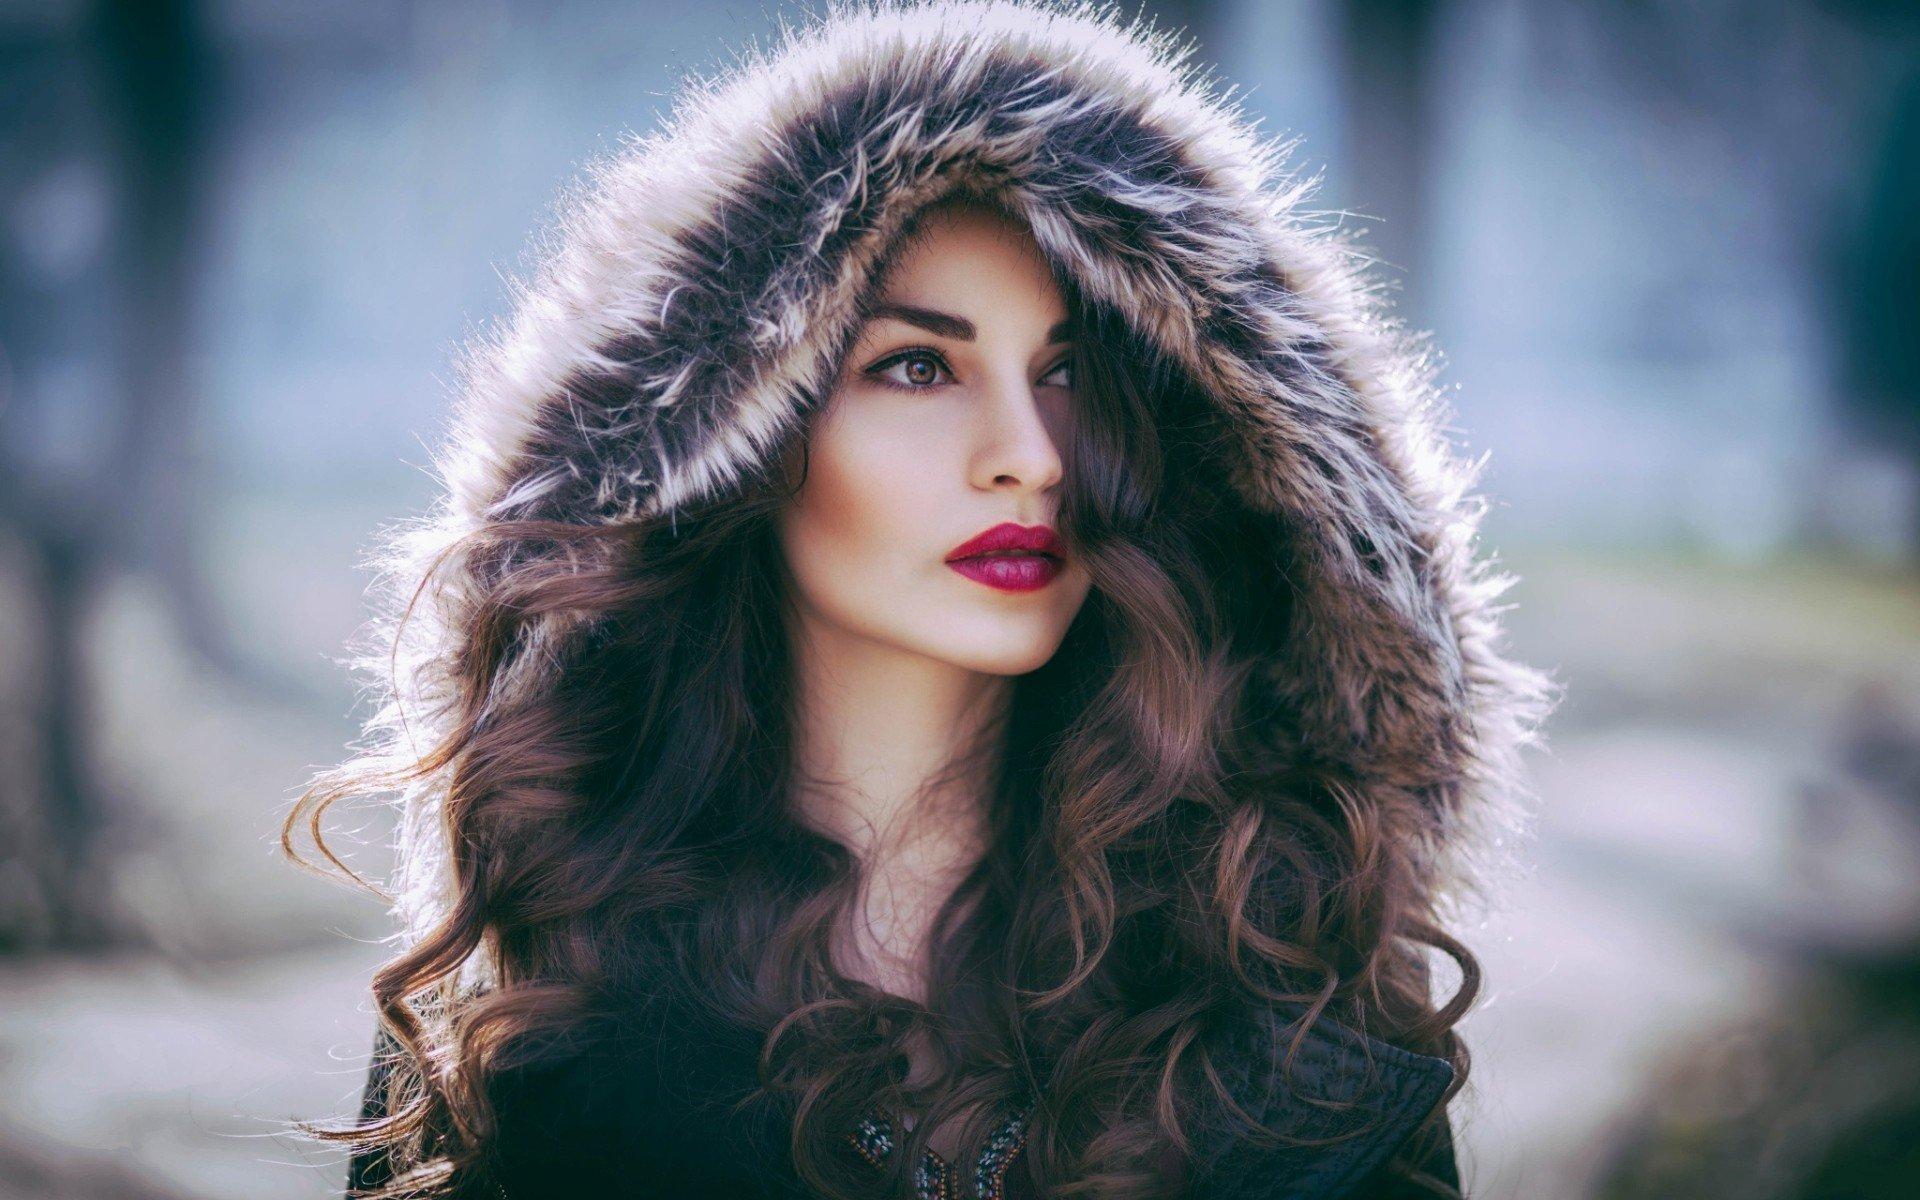 Red Lipstick Brown Hair Blue Eyes: Women, Brown Eyes, Red Lipstick, Fur Coats, Auburn Hair HD